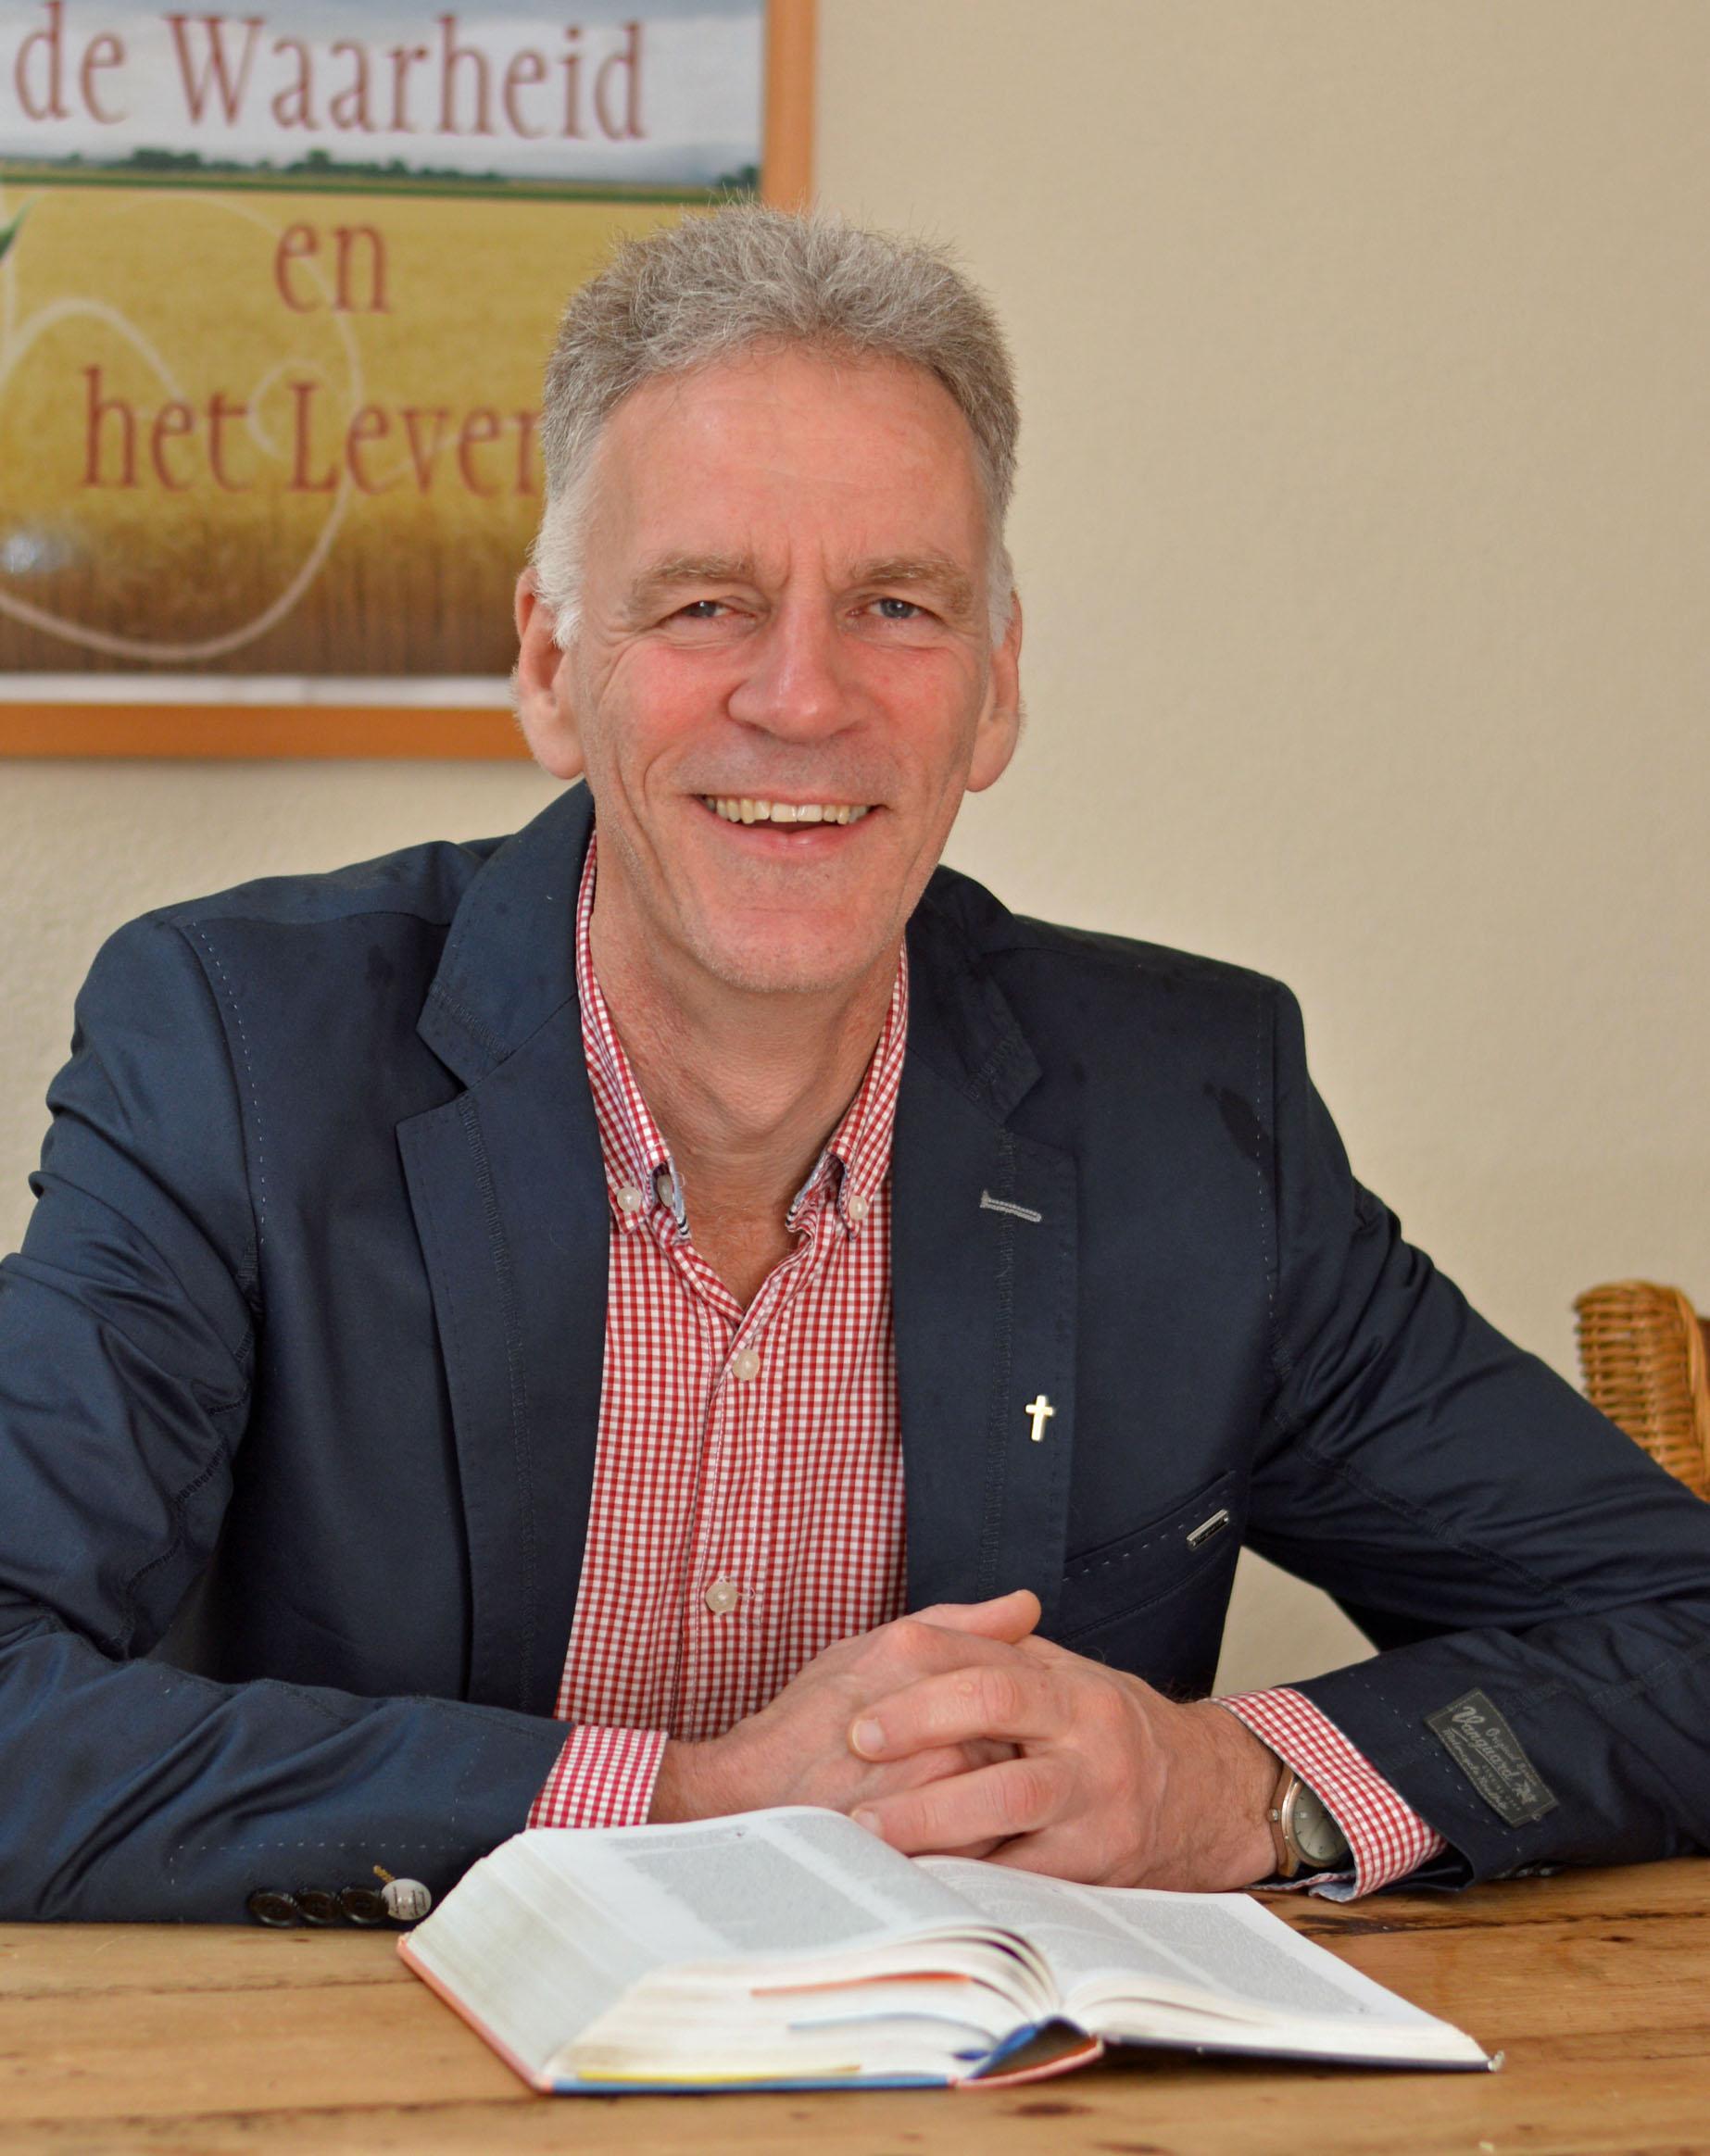 Willem Griffioen